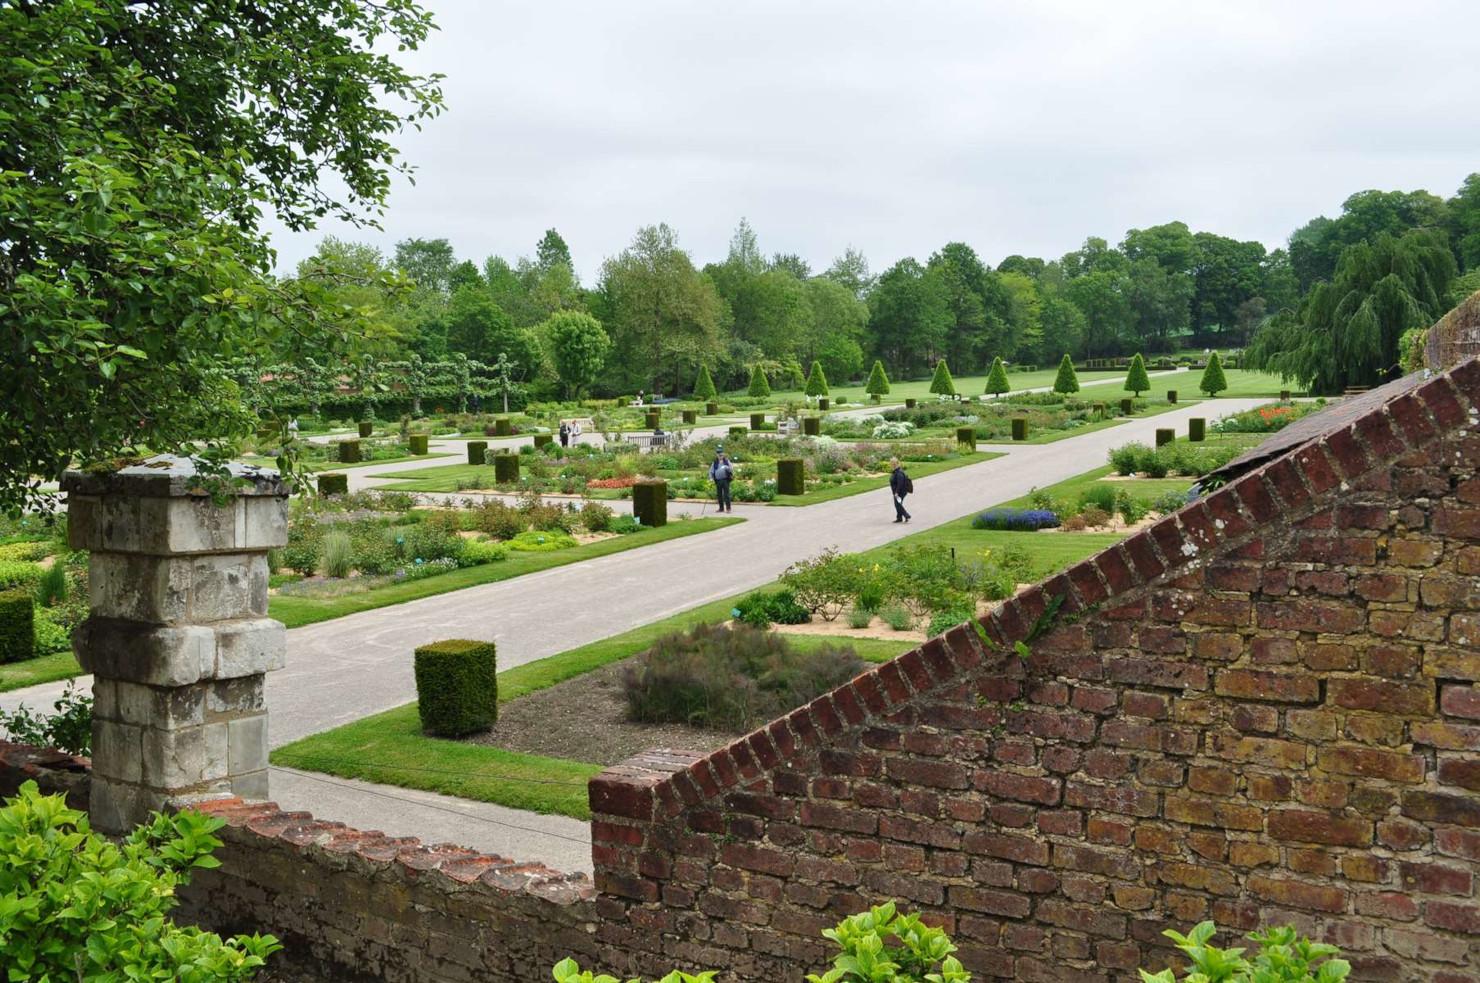 Somme Jardins Valloires